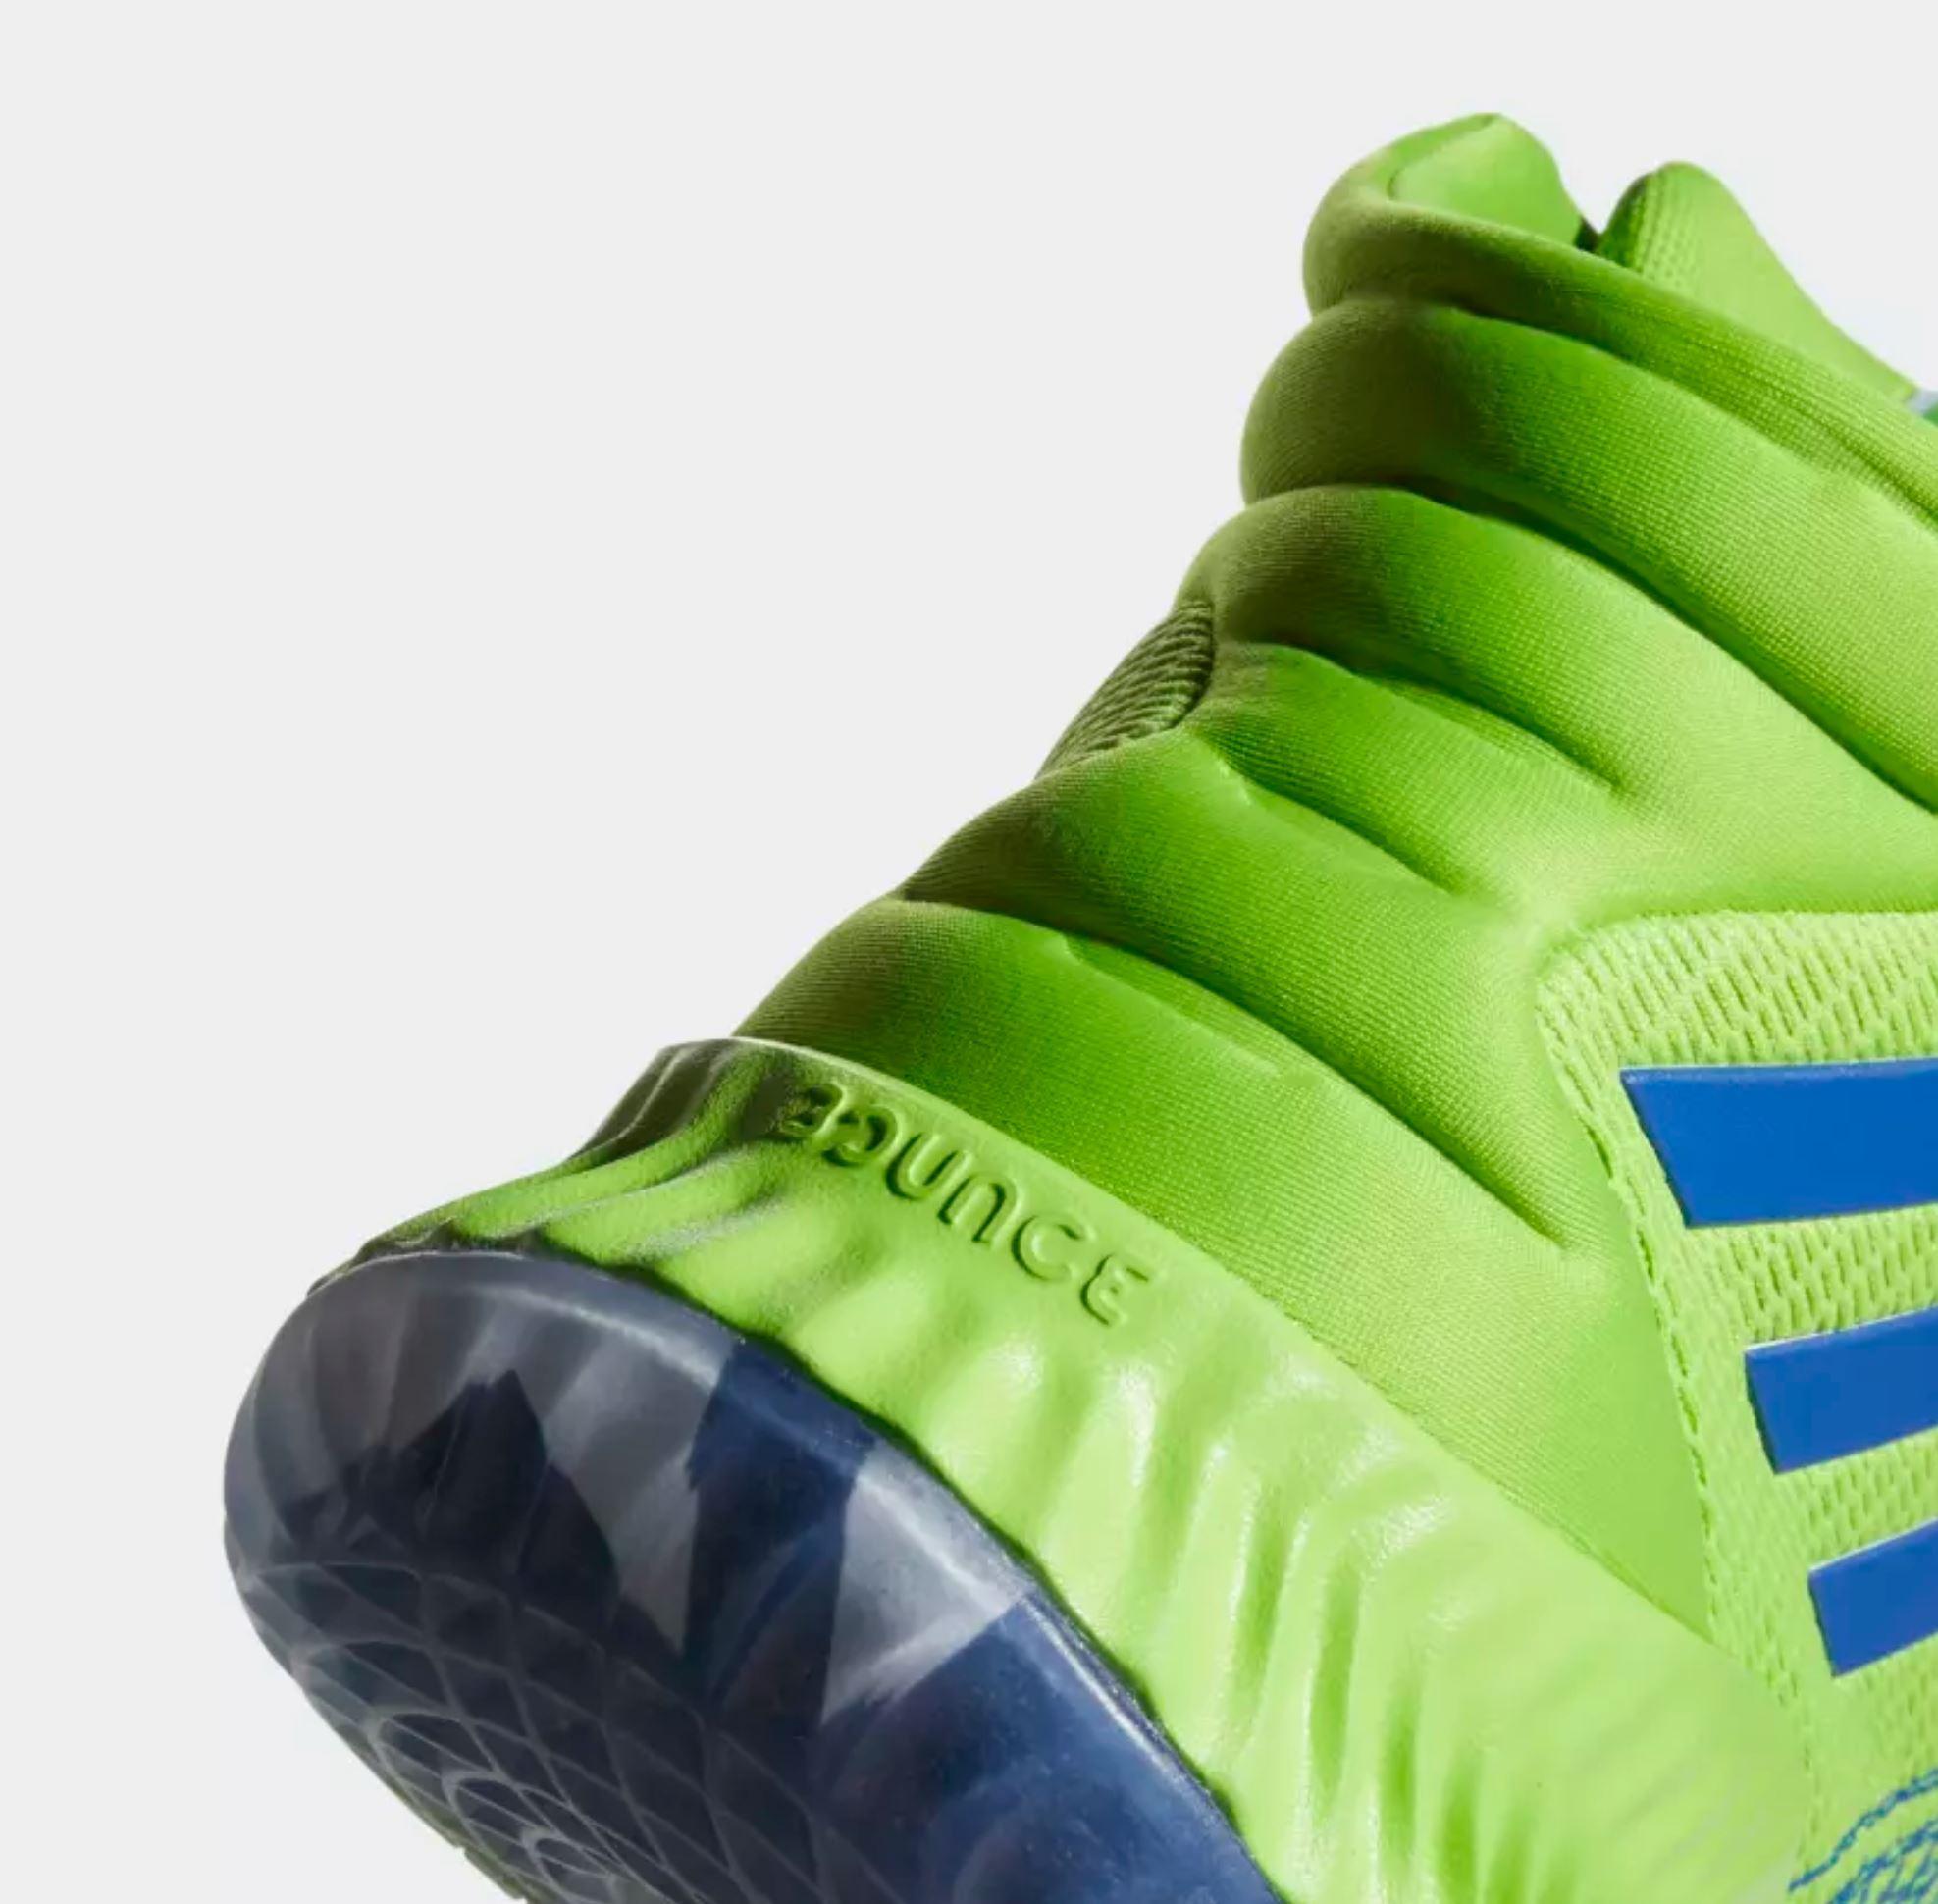 adidas pro bounce Andrew Wiggins PE heel